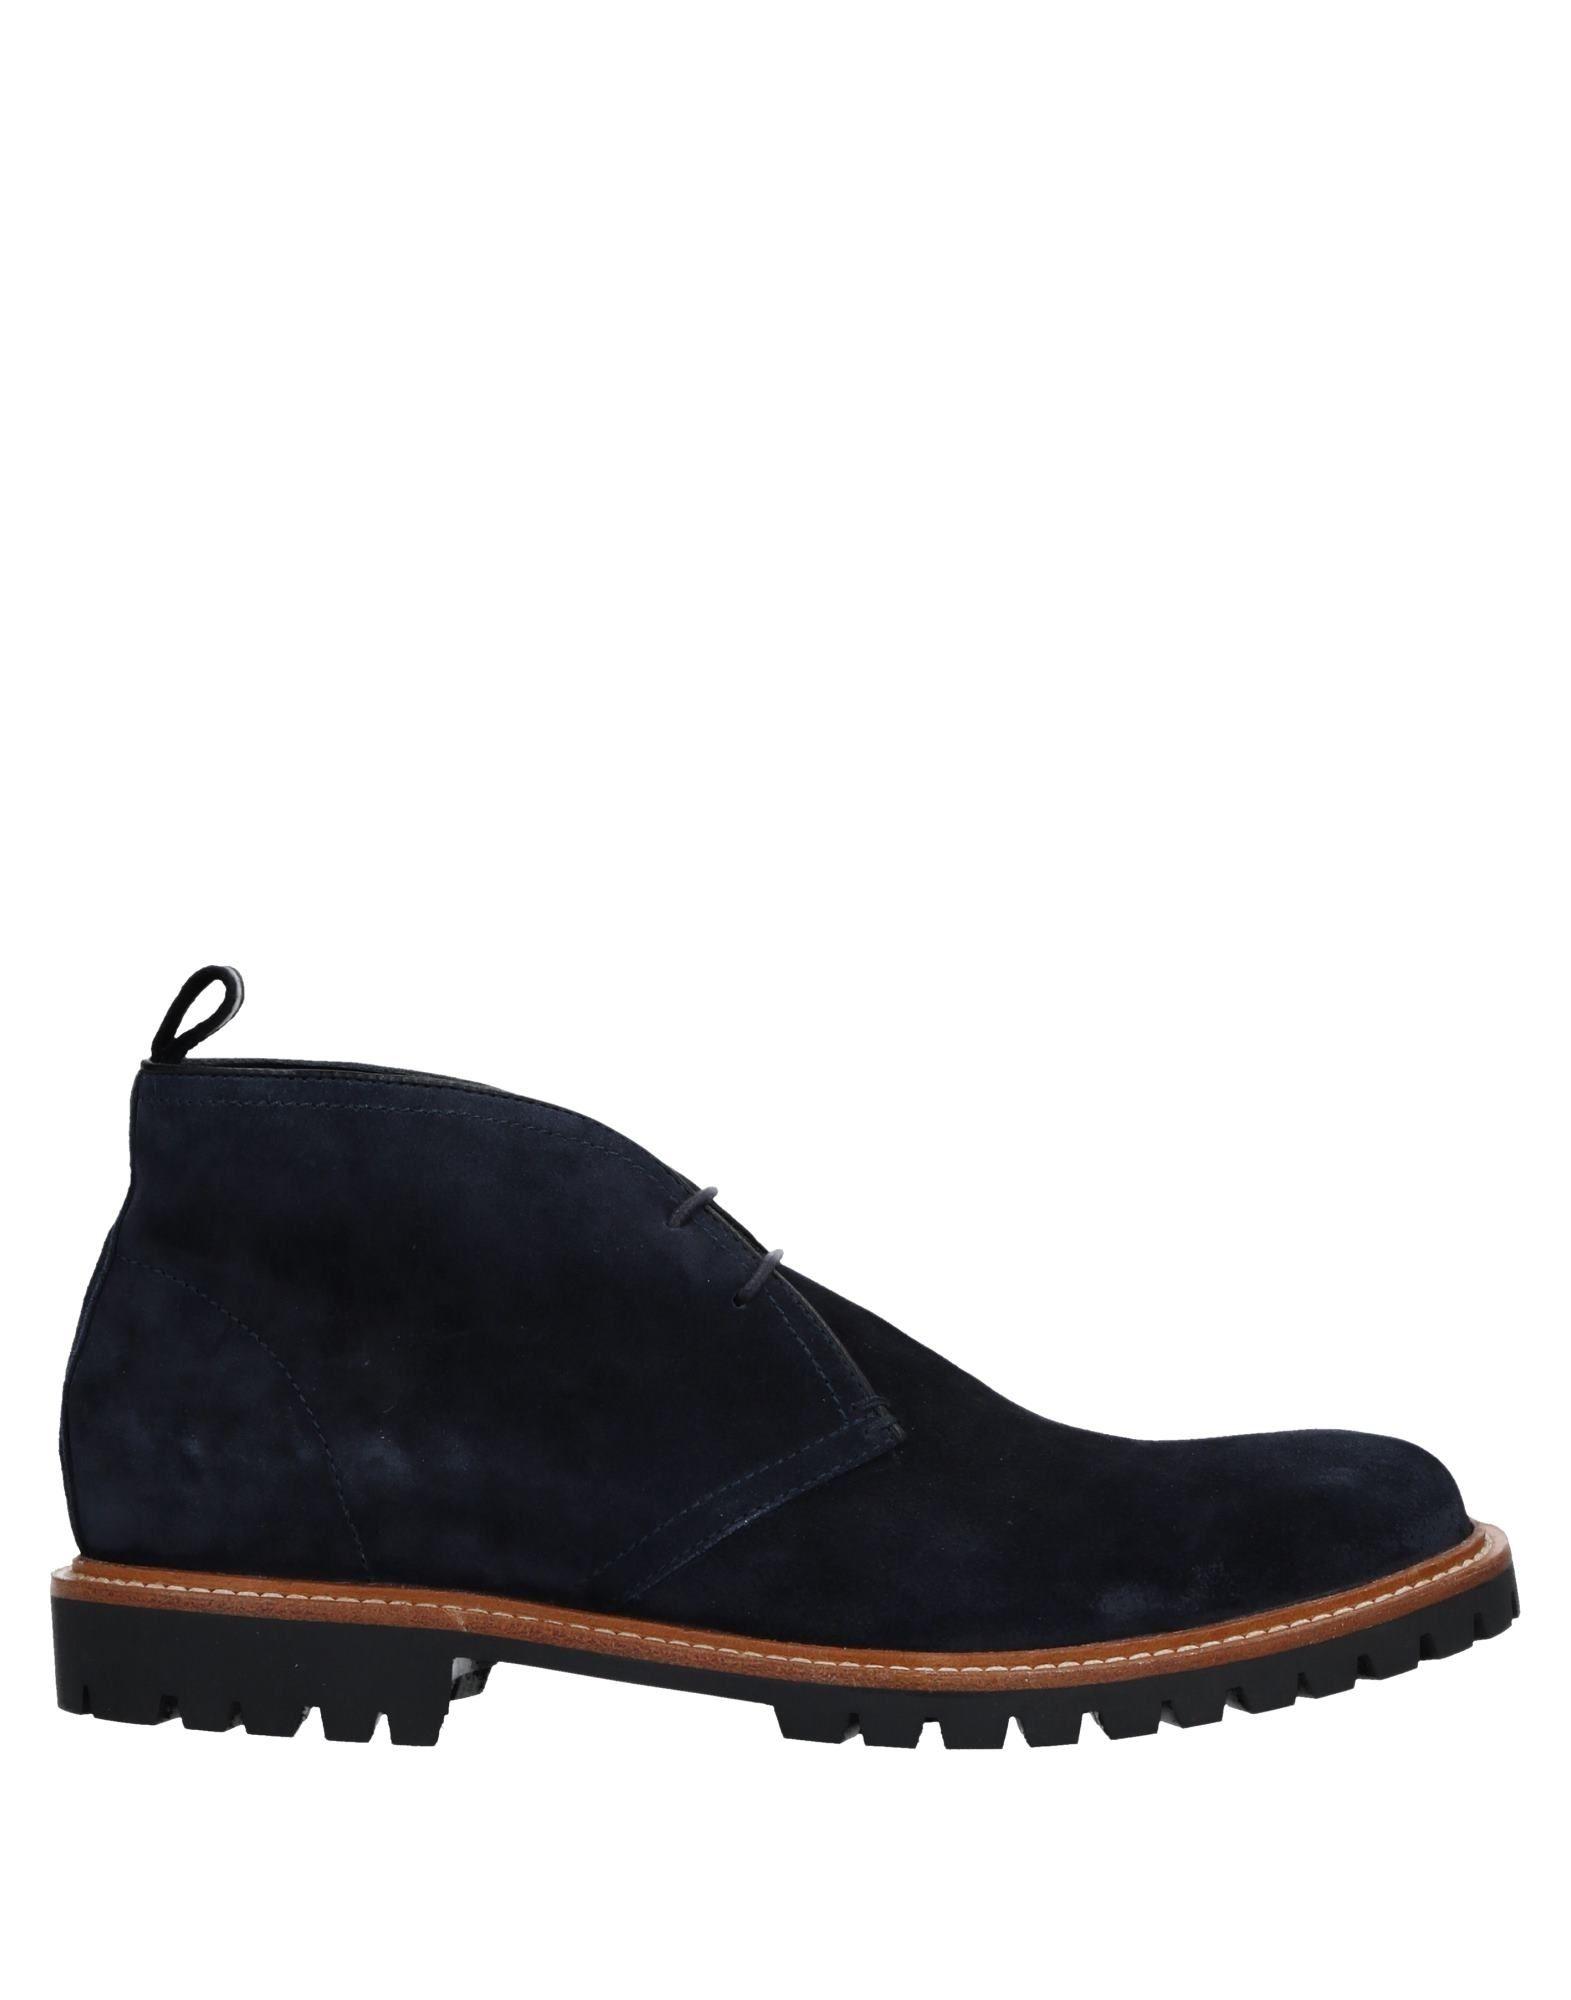 Rabatt echte Schuhe Voile Blanche Stiefelette Herren  11534642PL